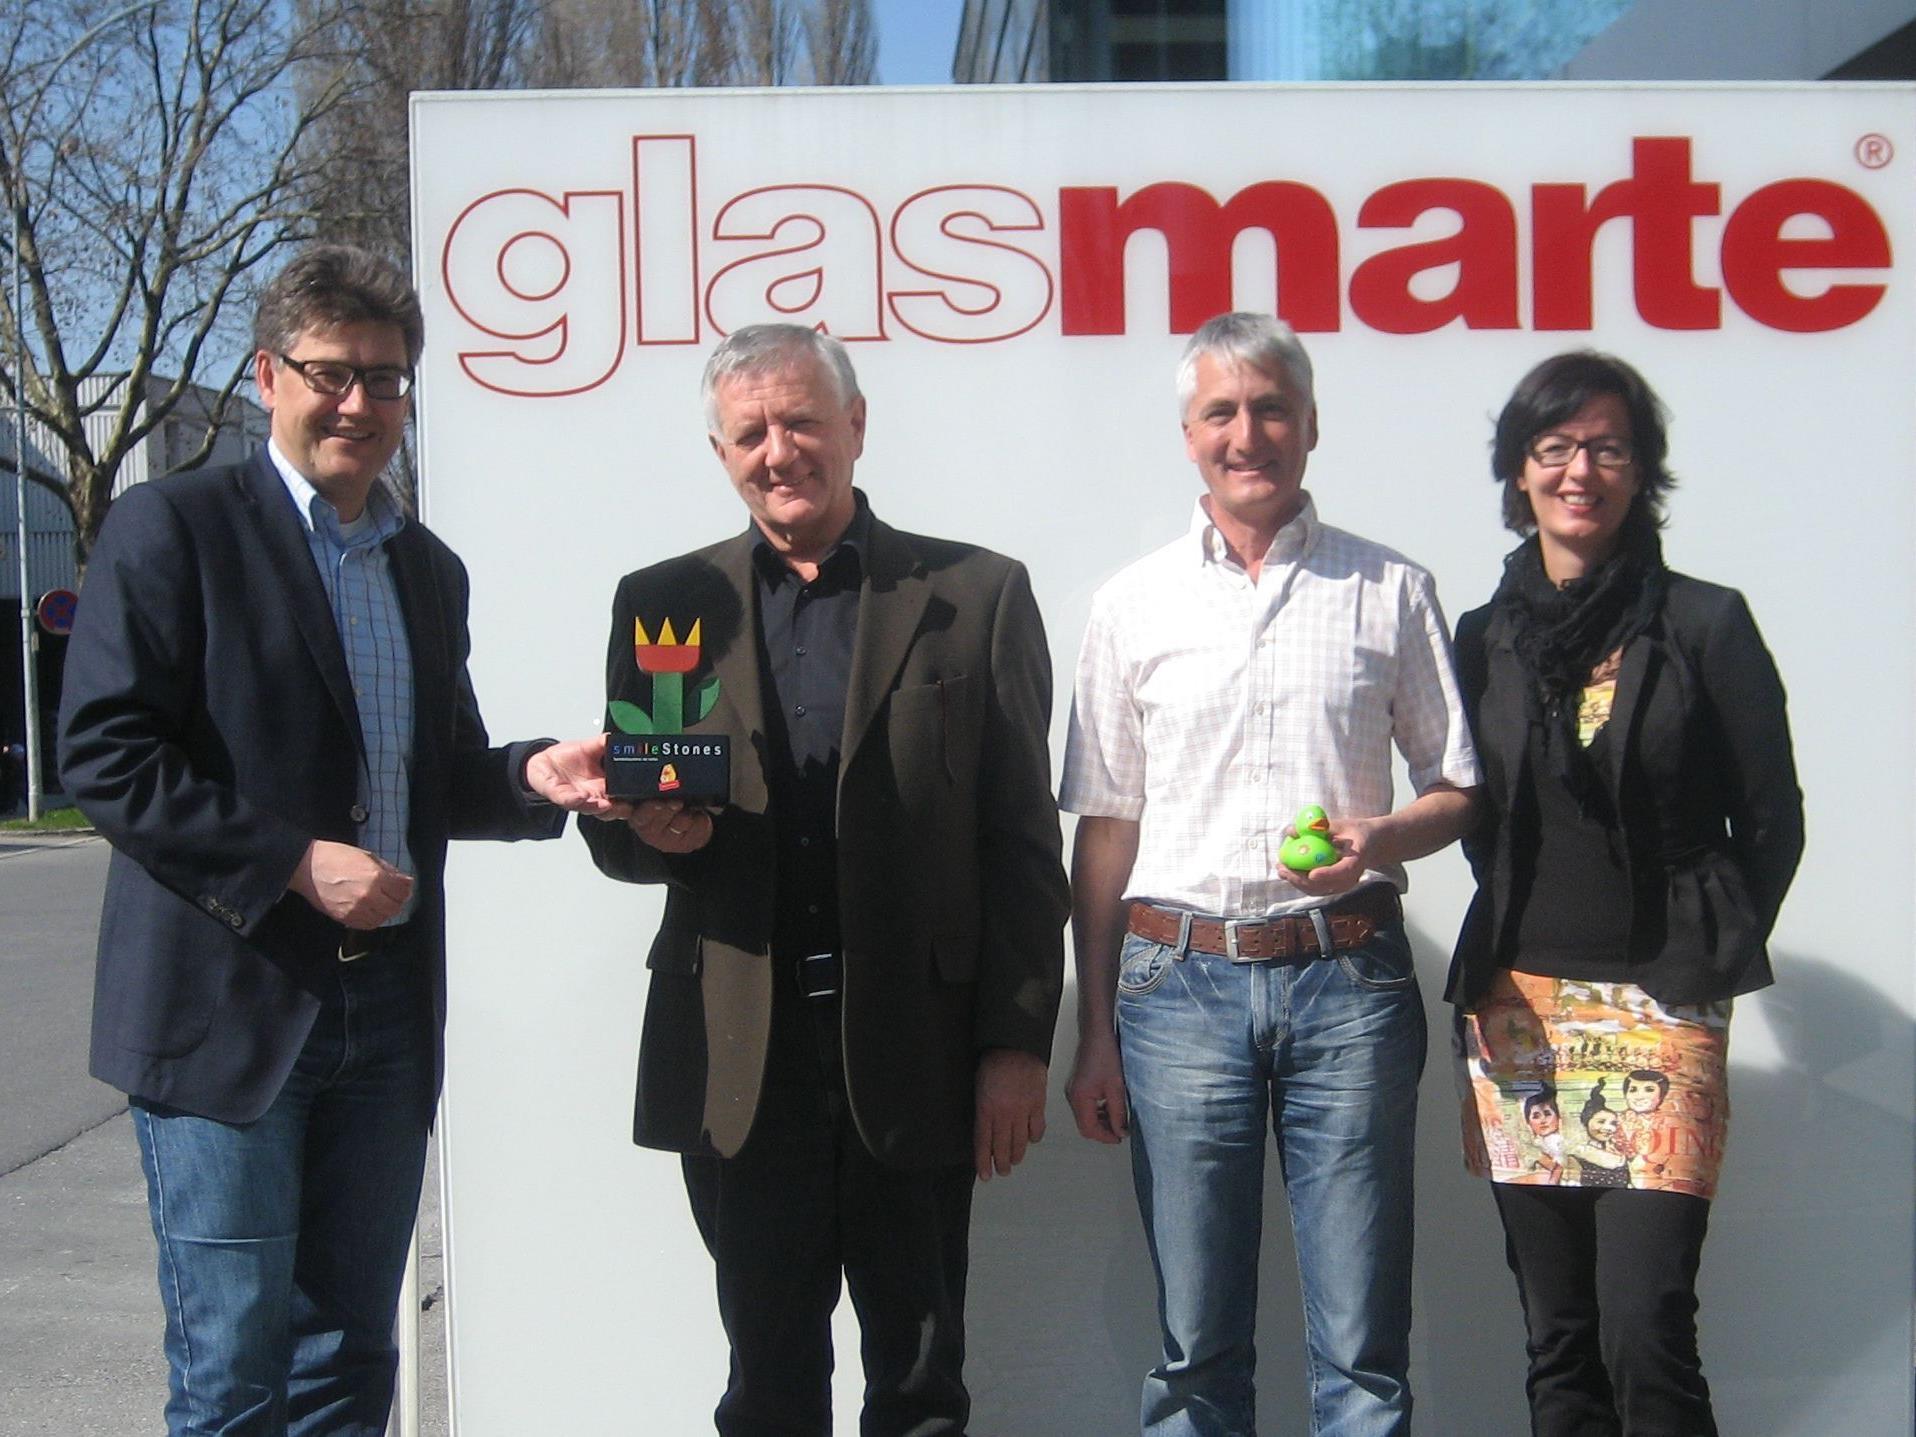 vlnr: Martin Feigl, Franz Abbrederis, Günter Böhler, Conny Amann